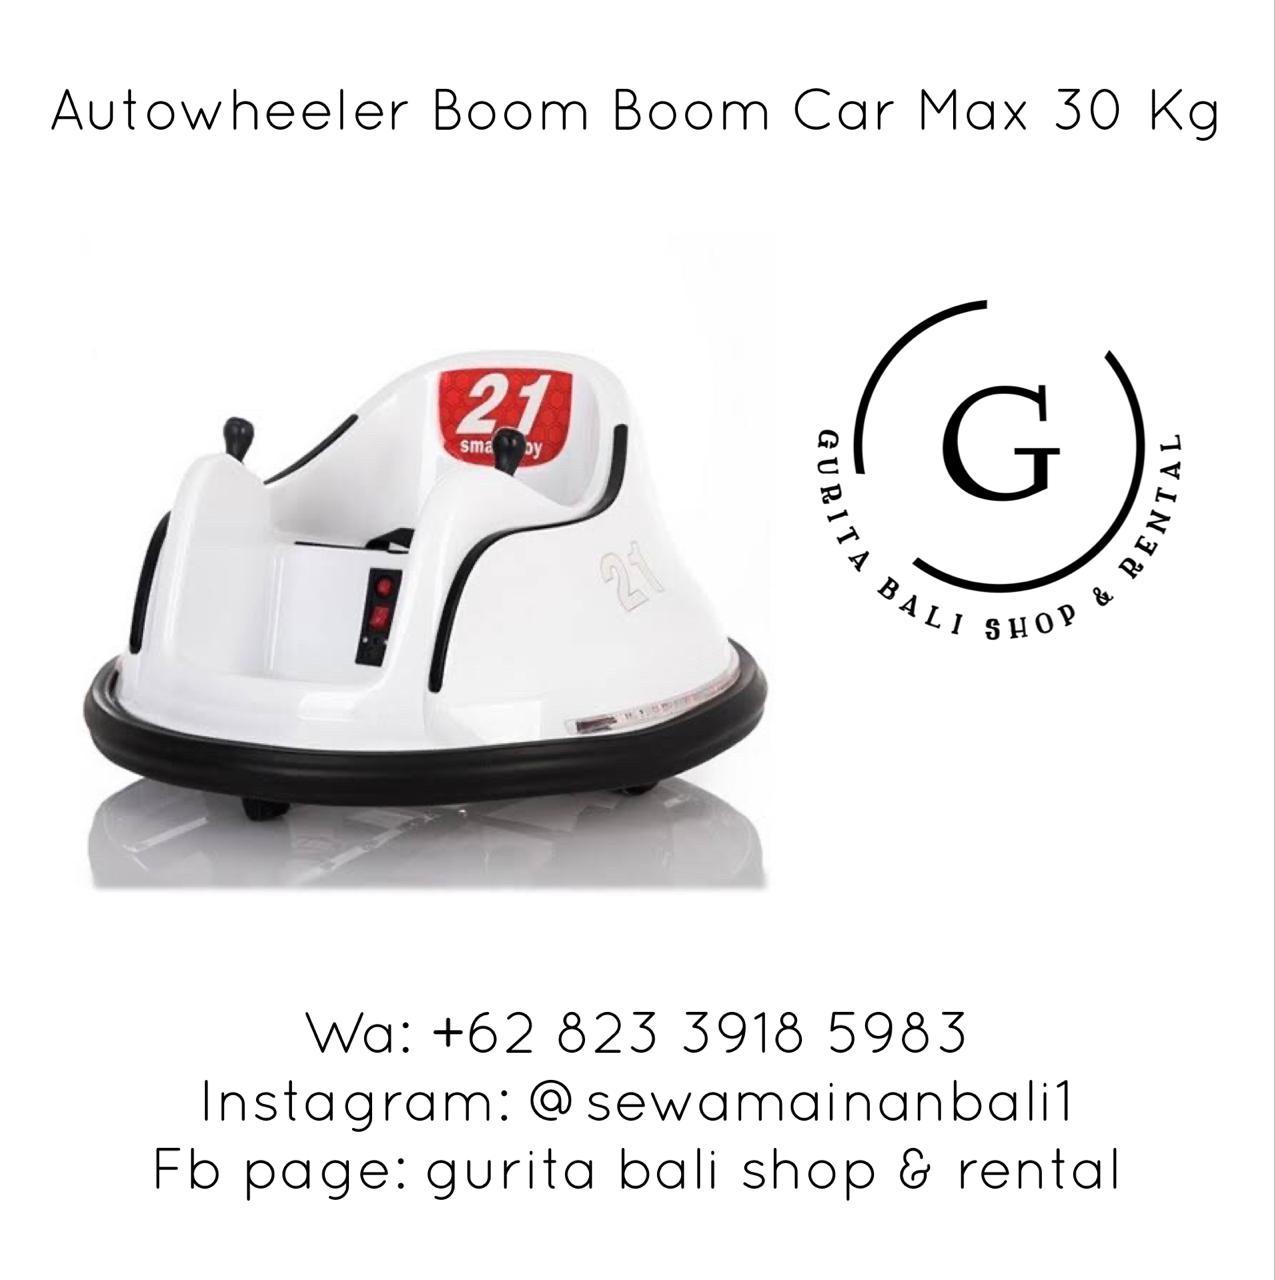 AUTOWHEELER BOOM BOOM CAR 3